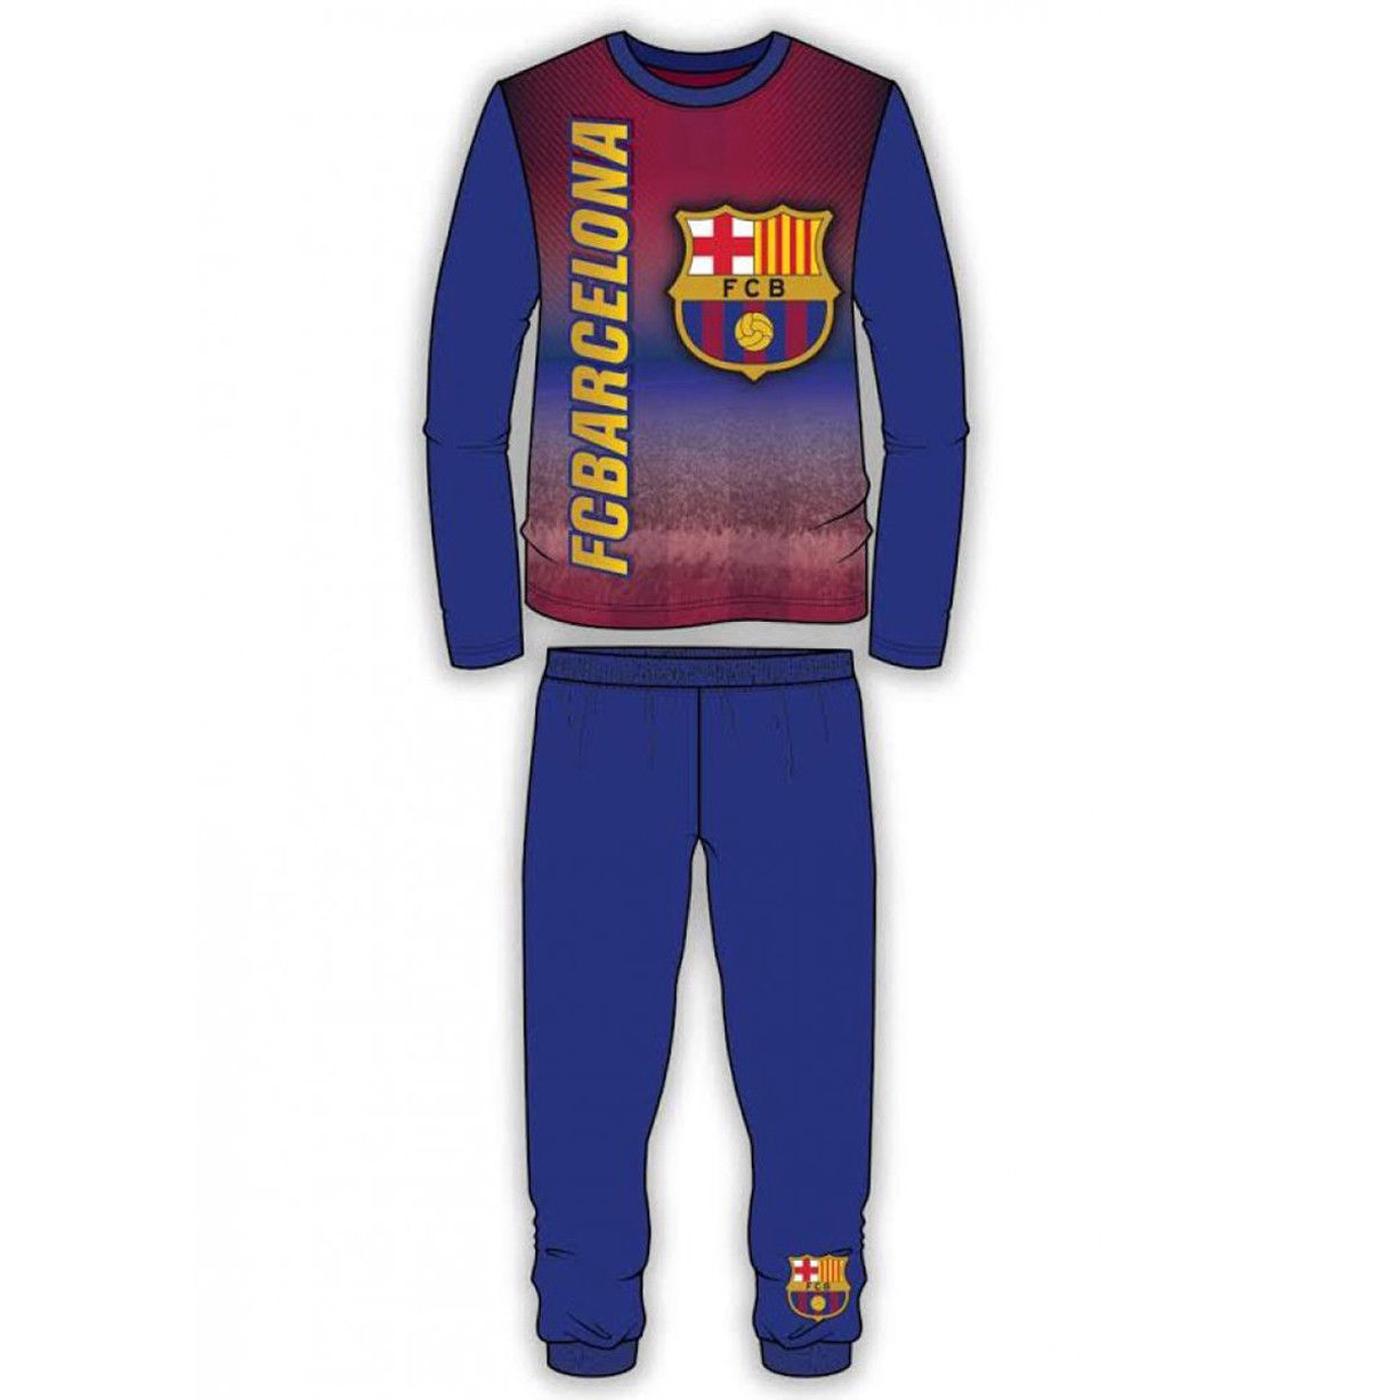 FC-Barcelone-Officiel-Enfants-Garcons-Pyjamas-Nightwear-Pyjama-Set-Pyjamas-Sleepwear-FCB